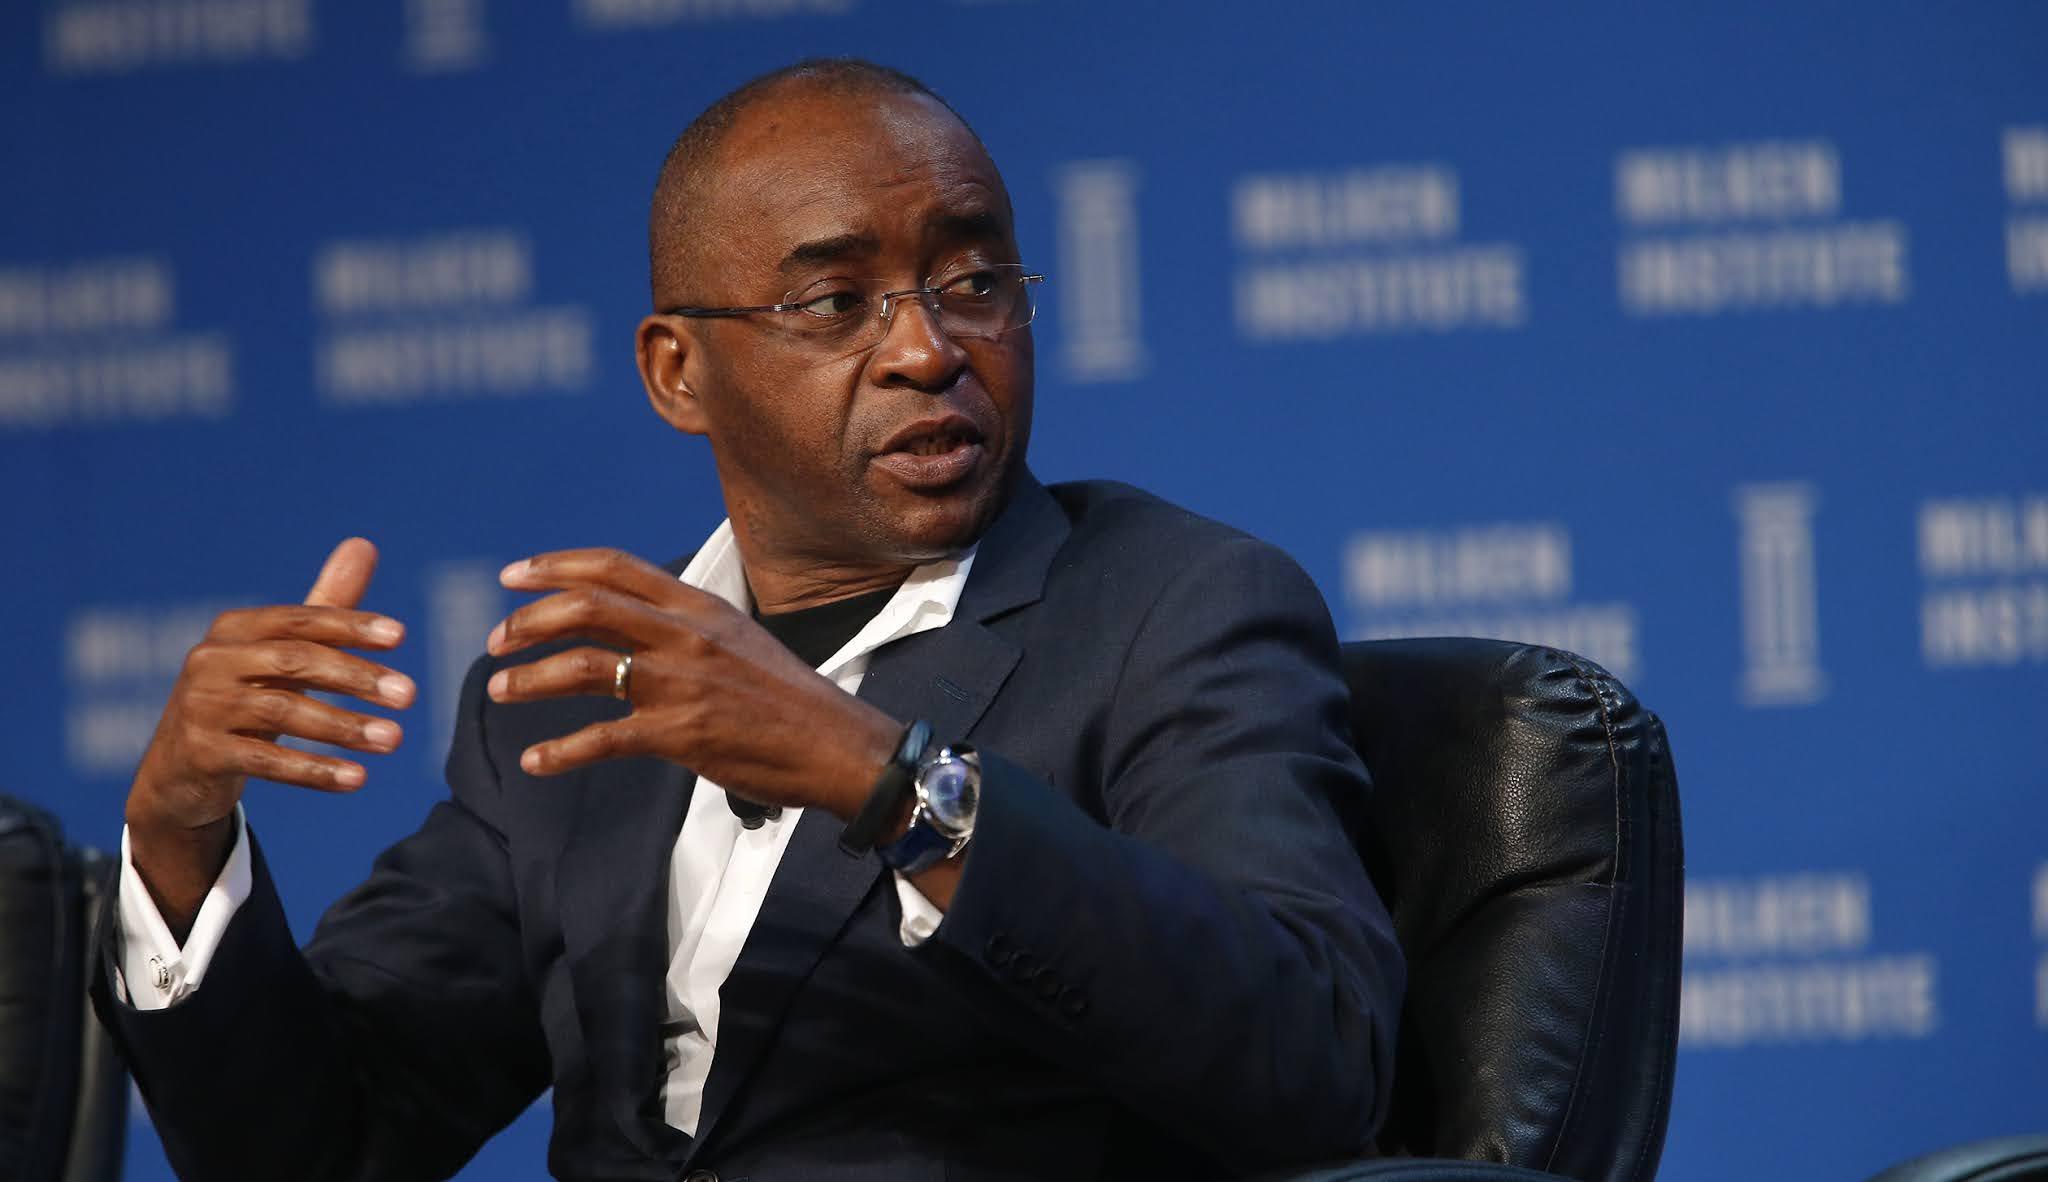 Netflix Appoints Zimbabwean Billionaire Strive Masiyiwa To Its Board Of Directors